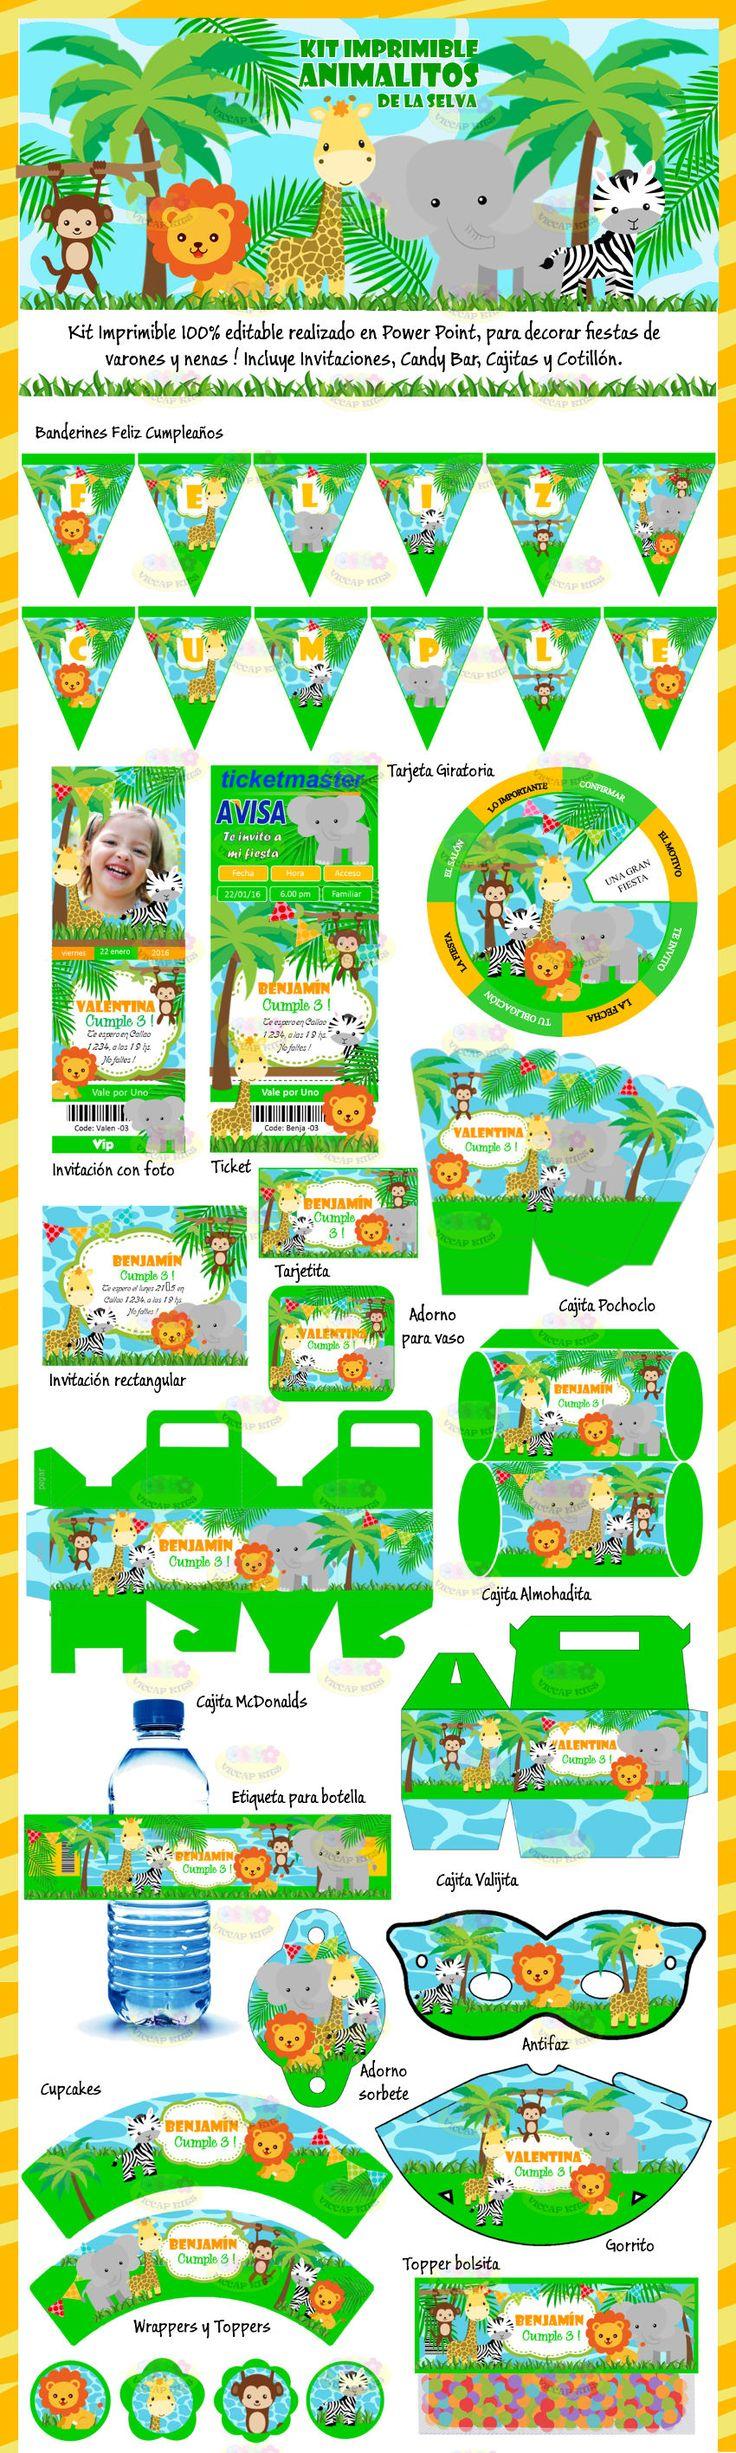 M 225 s de 1000 ideas sobre decoraciones de fiesta de safari en pinterest - Kit Imprimible Animalitos De La Selva Invitaciones Candy Bar